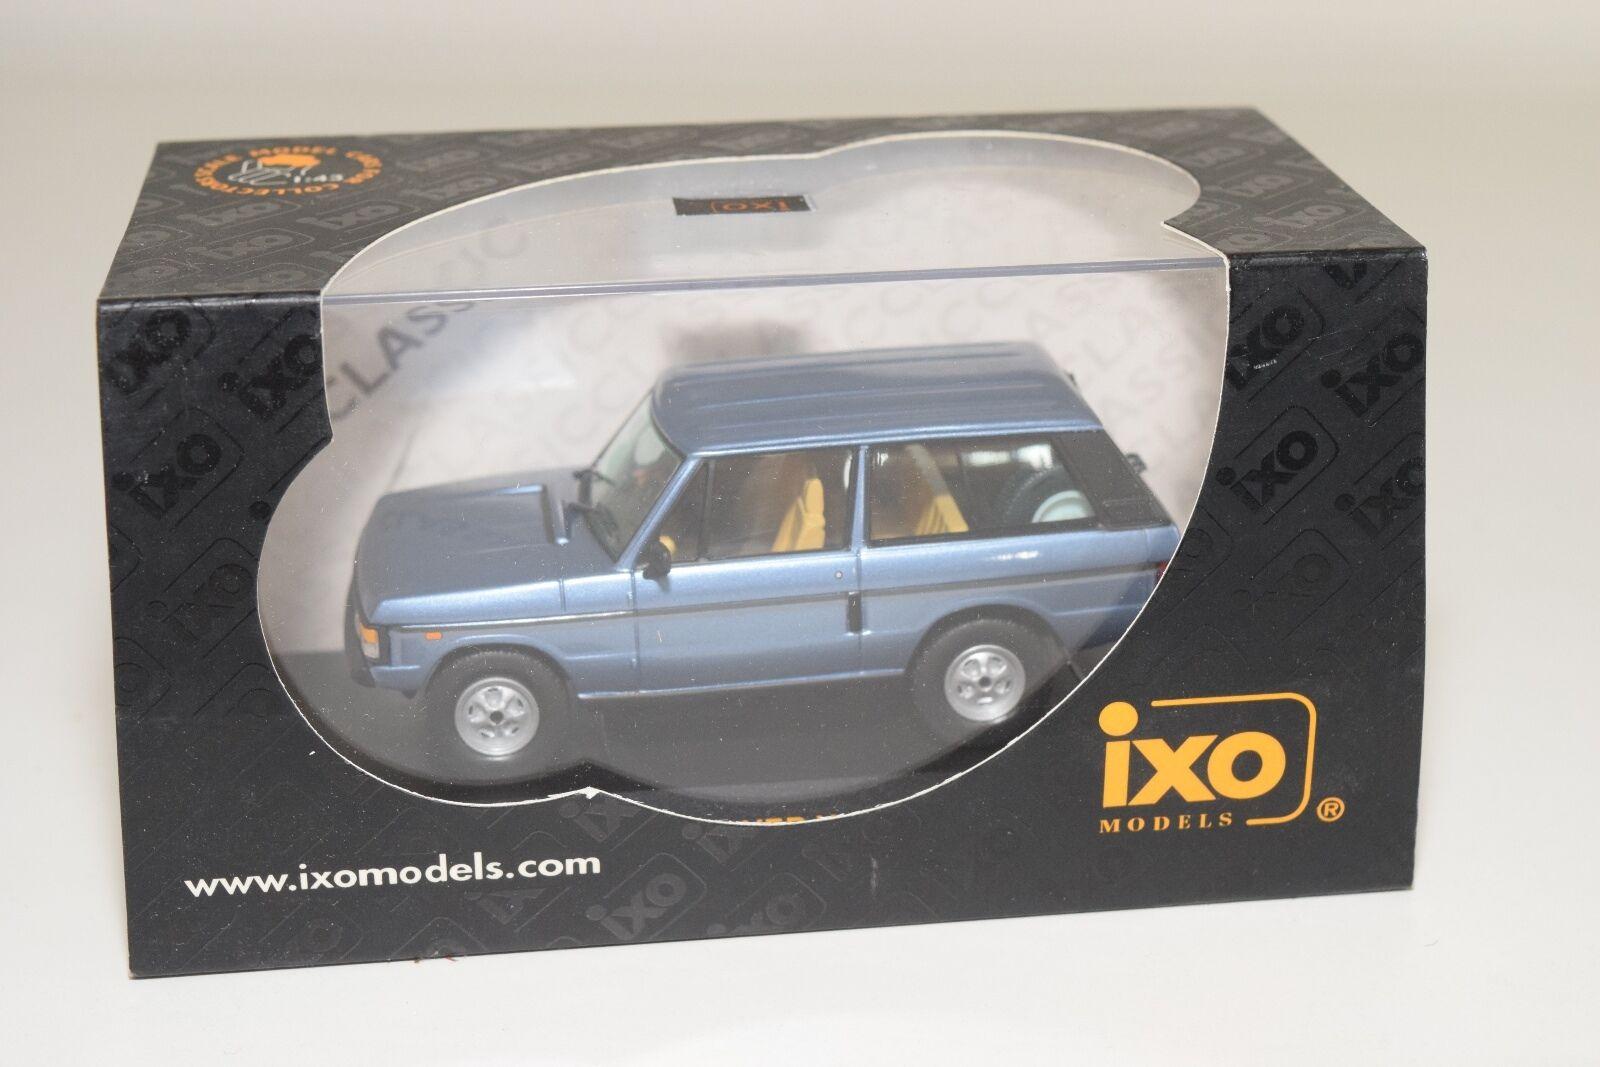 . IXO CLC038 RANGE ROVER VOGUE 1980 METALLIC Blau MINT BOXED RARE SELTEN RARO